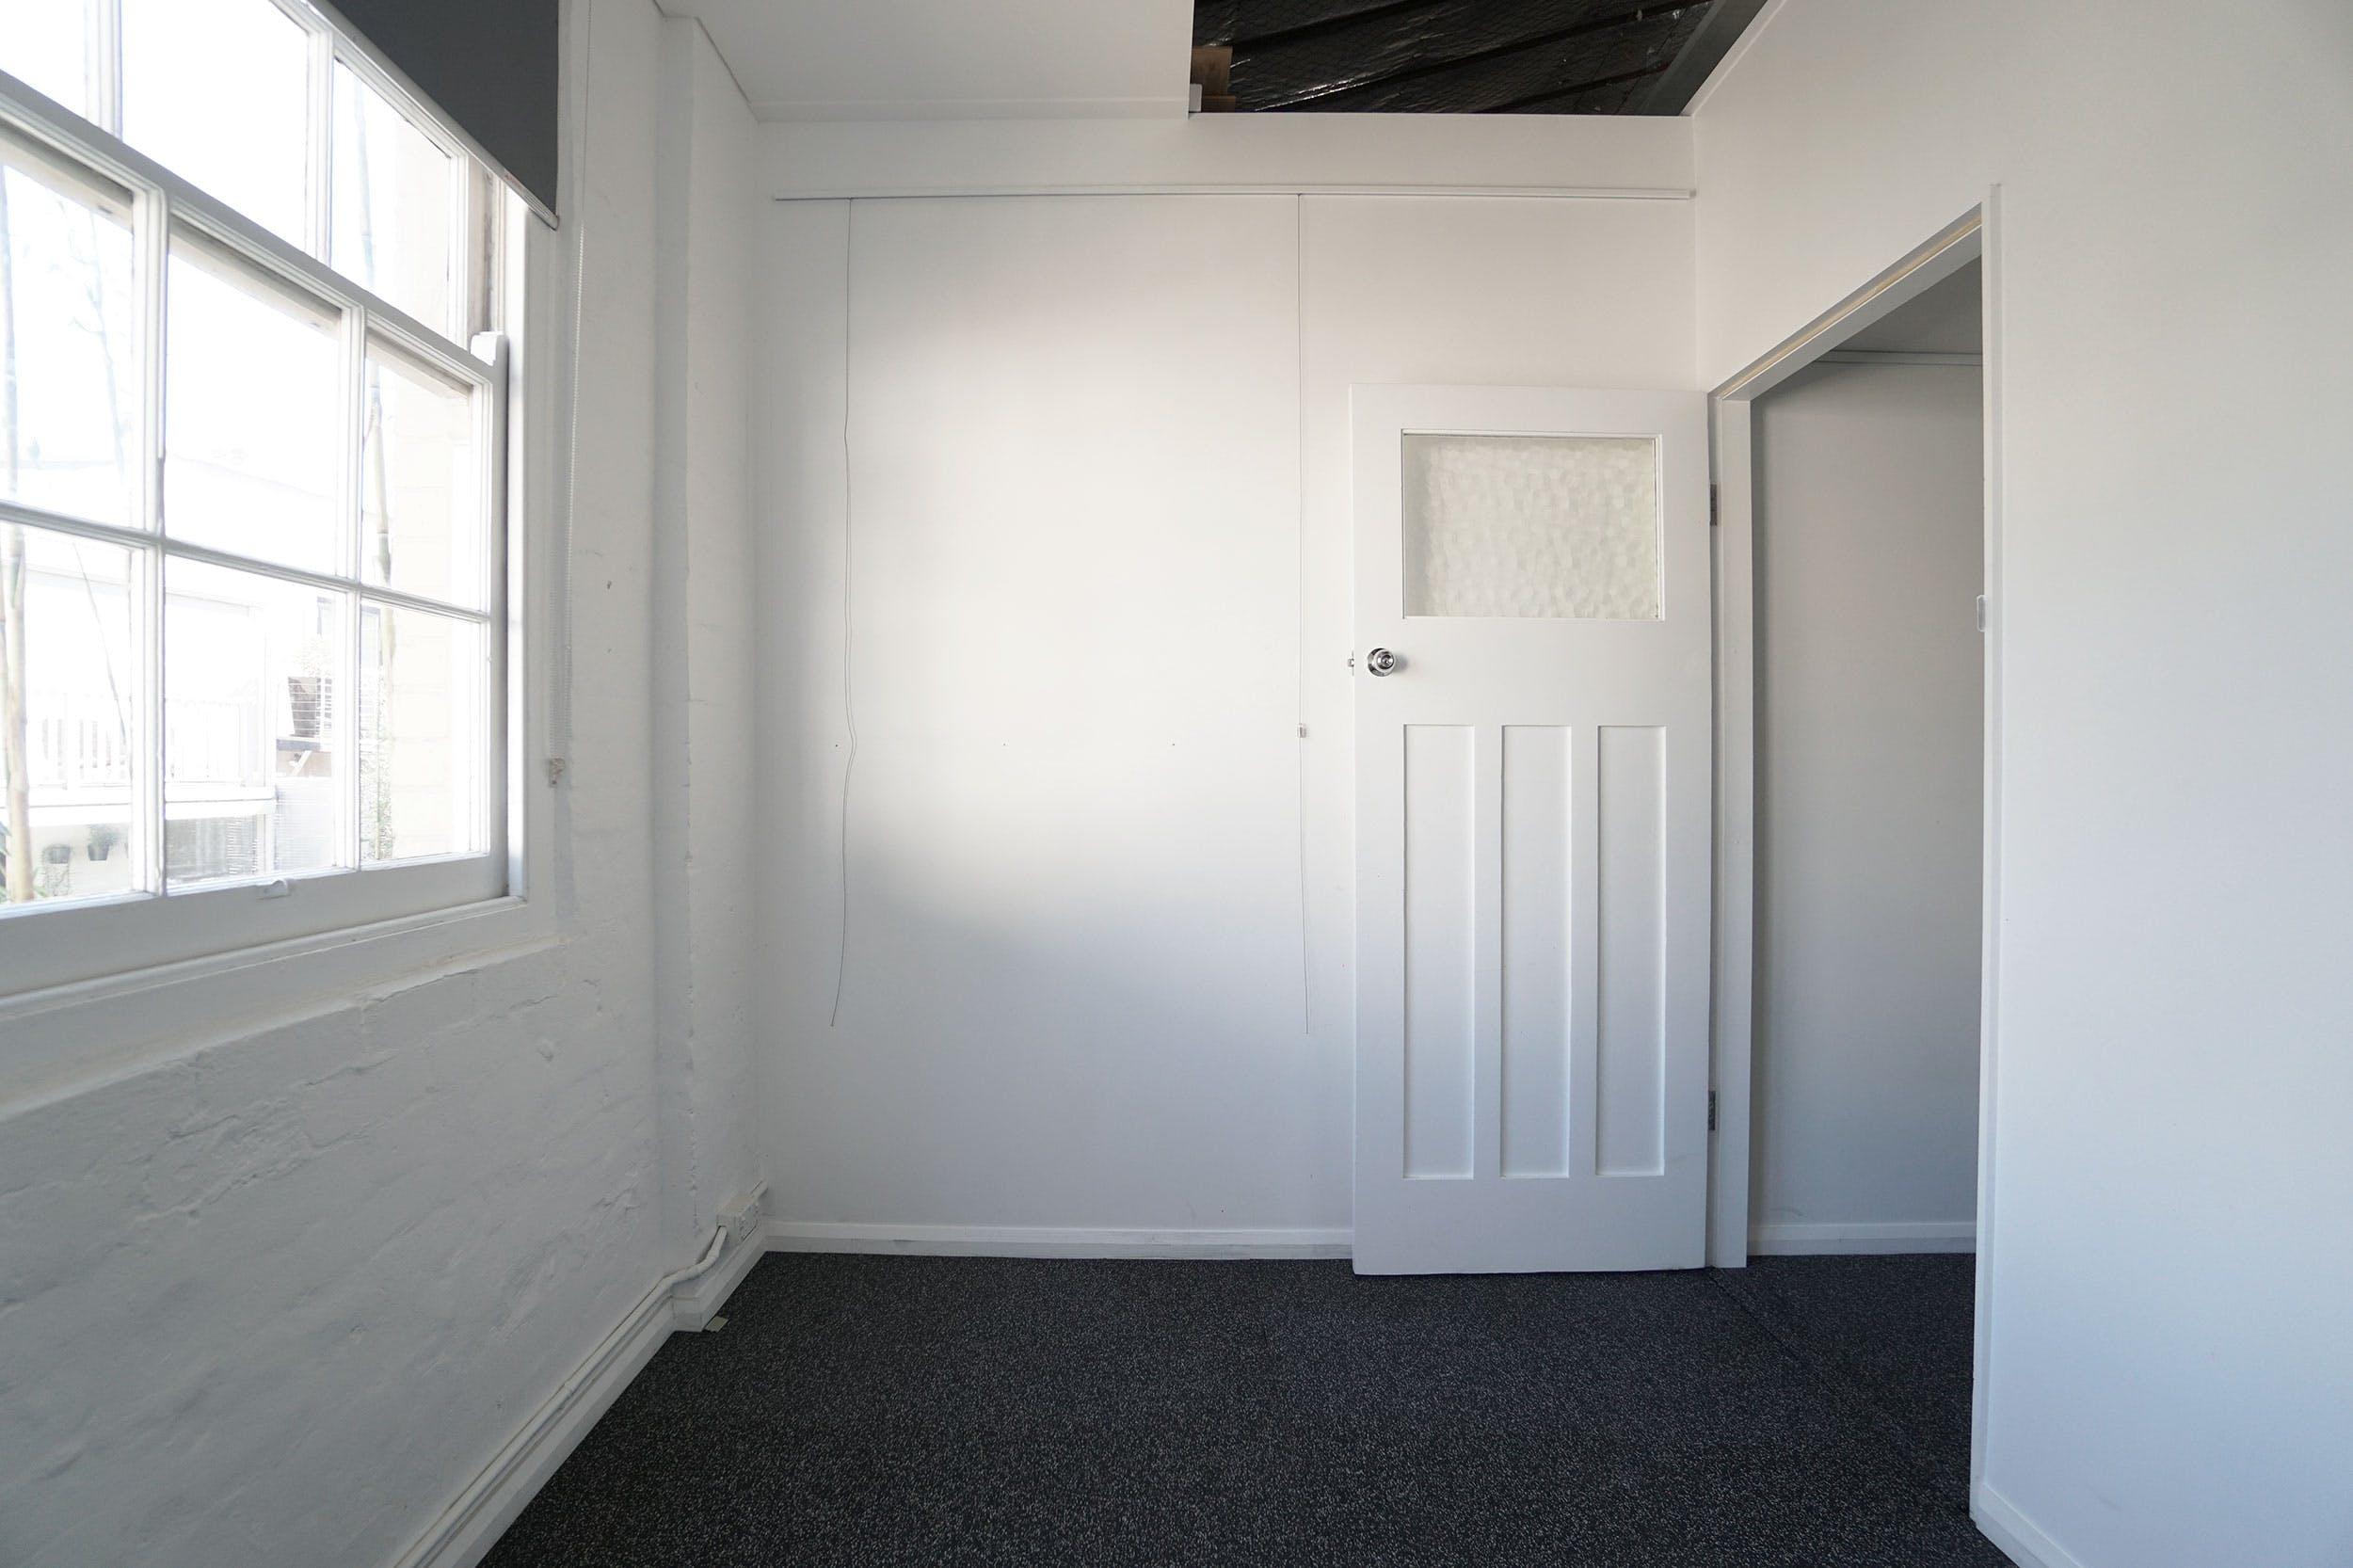 Studio 11, creative studio at Comber Street Studios, image 1